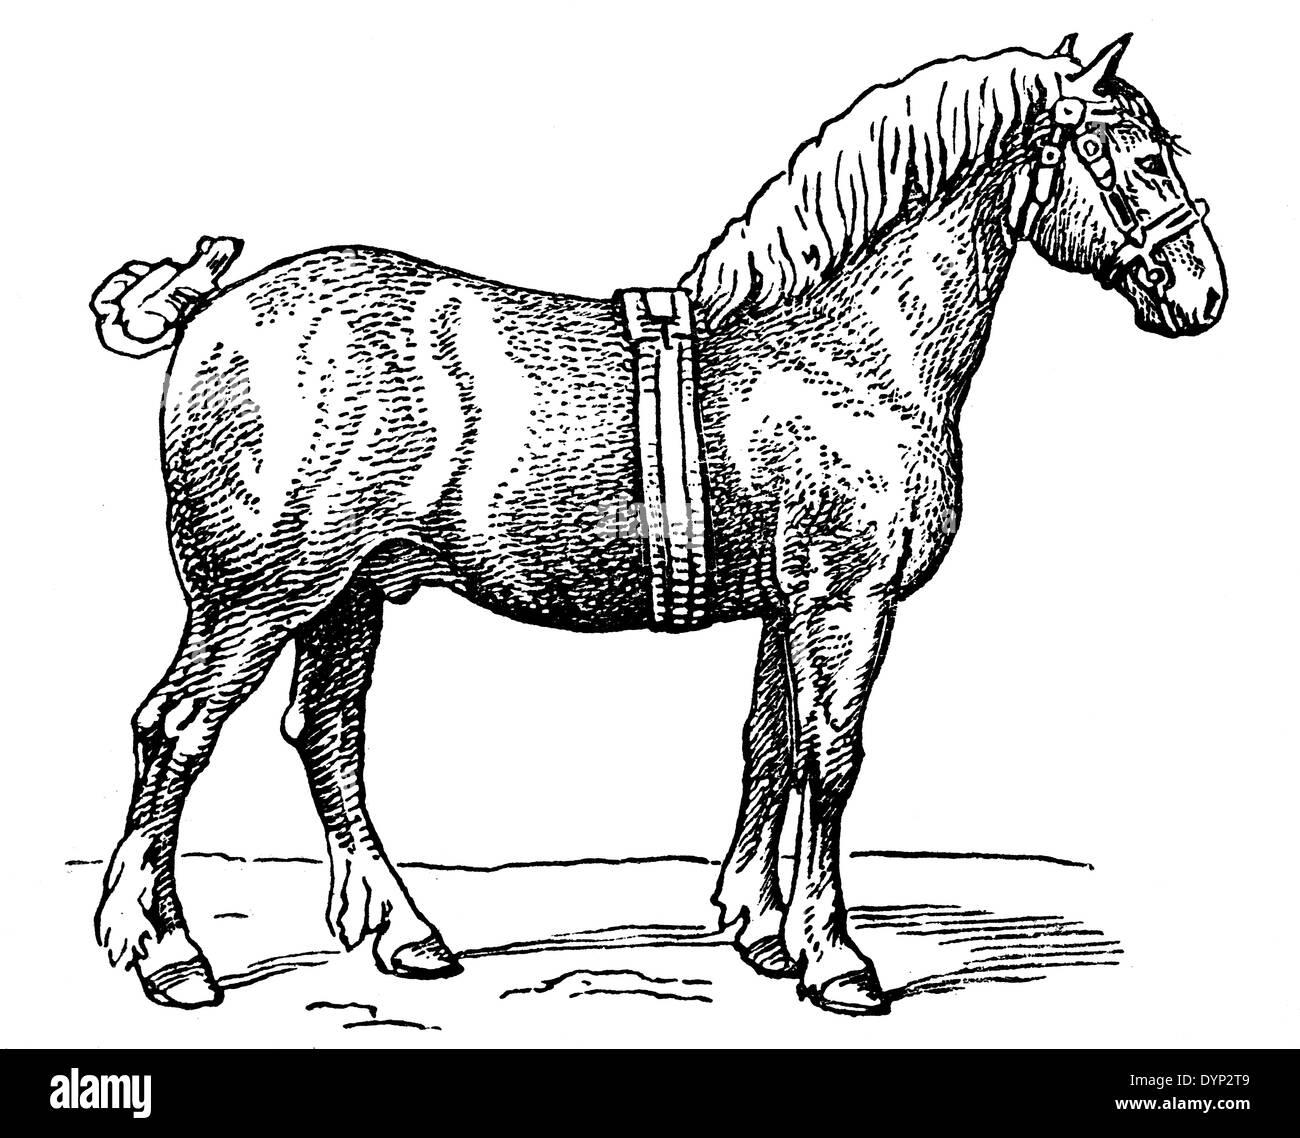 Ardennes horse, illustration from Soviet encyclopedia, 1926 - Stock Image